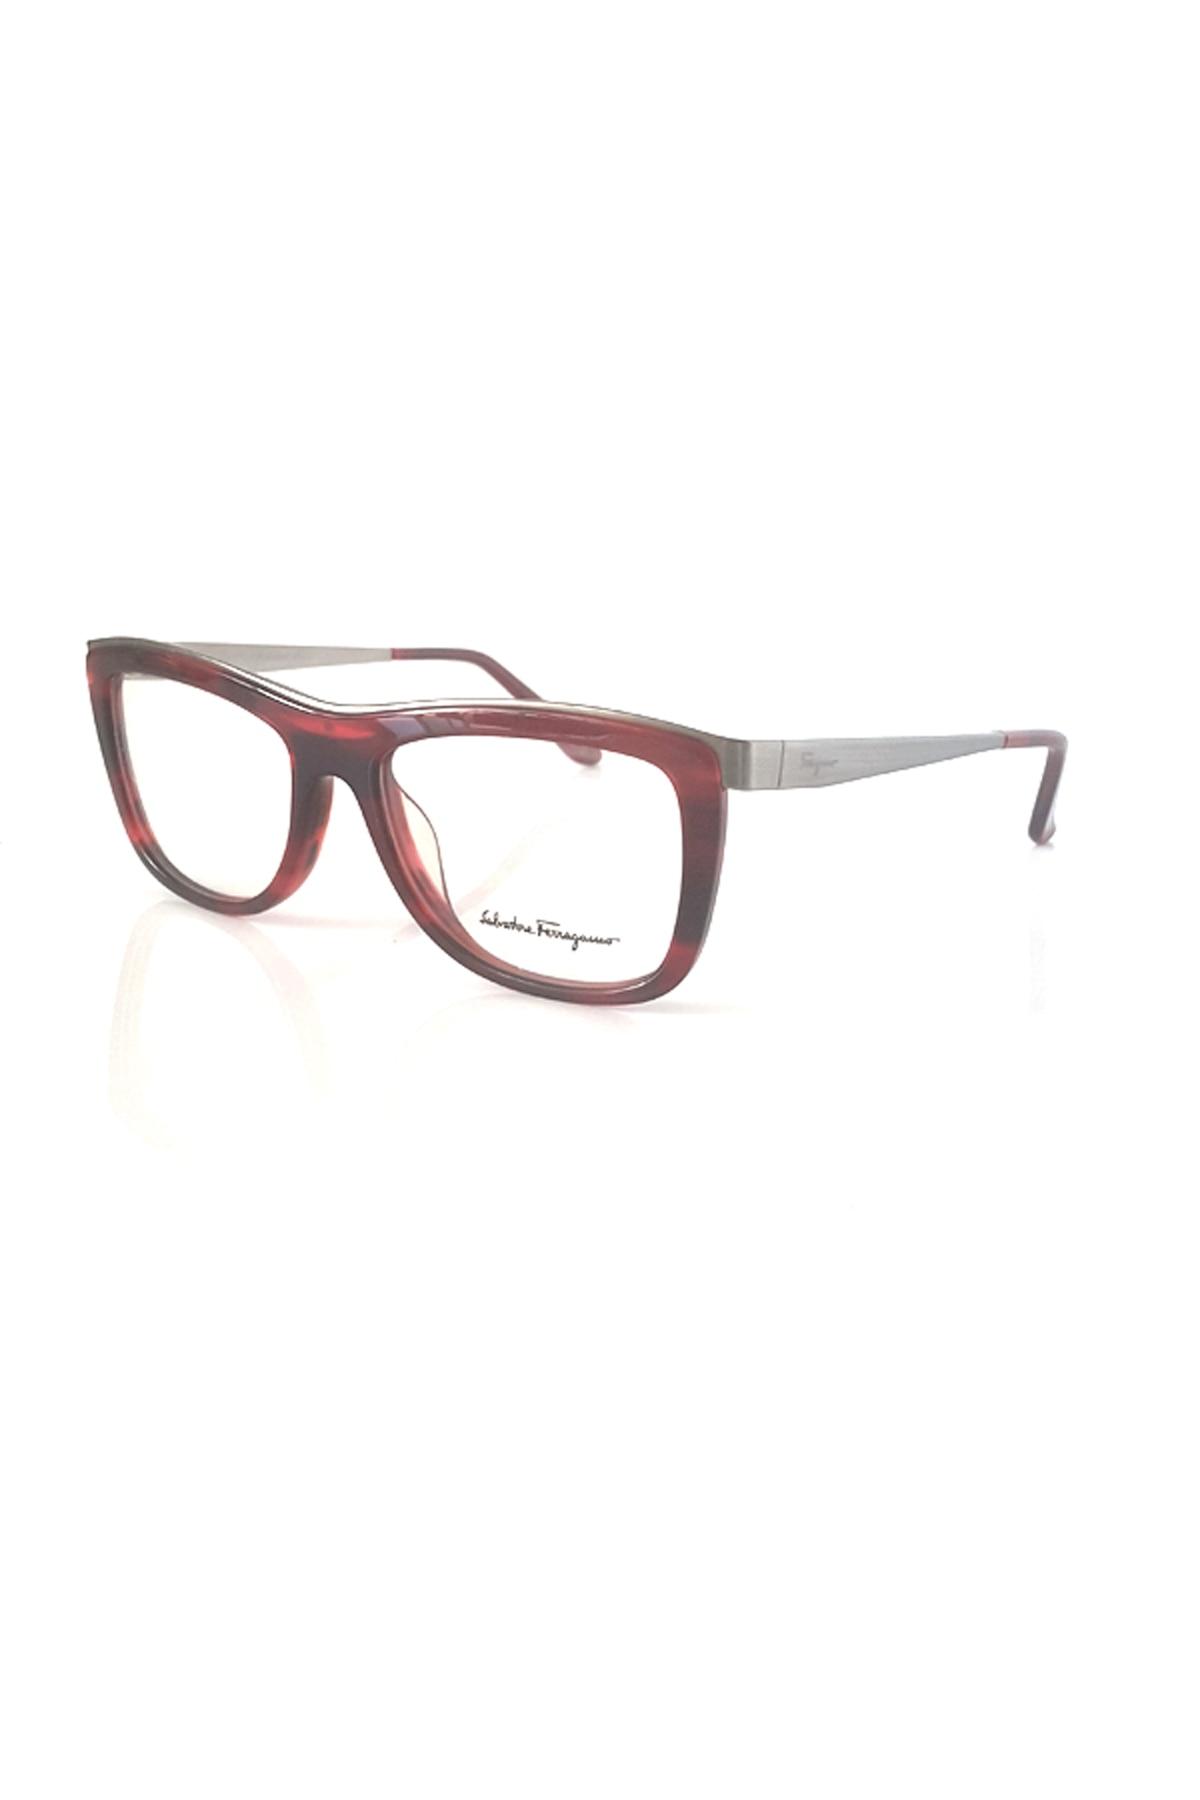 Markamilla Women Reading Glasses Frame Demo Glasses Eyewear Transparent High Quality WomenSalvatore Ferragamo SF 2626 608